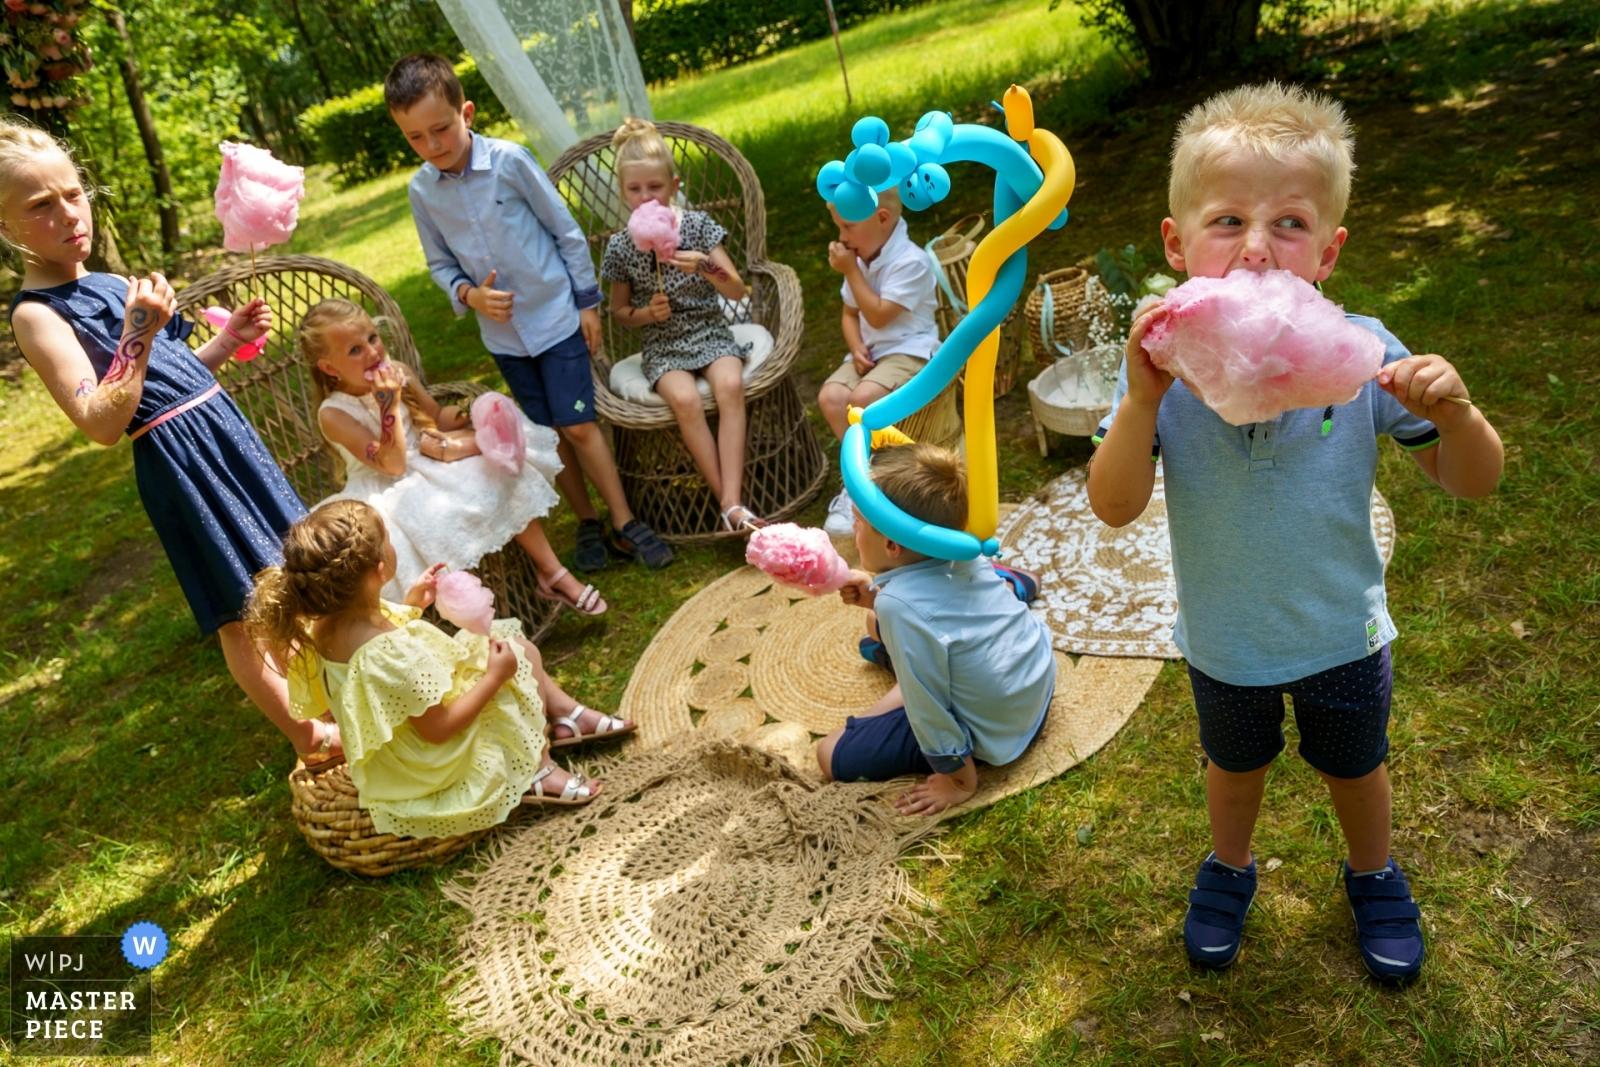 candy cotton joy - Overijssel, Netherlands Wedding Photography -    De Lutte, Jan Wesselinkhoes